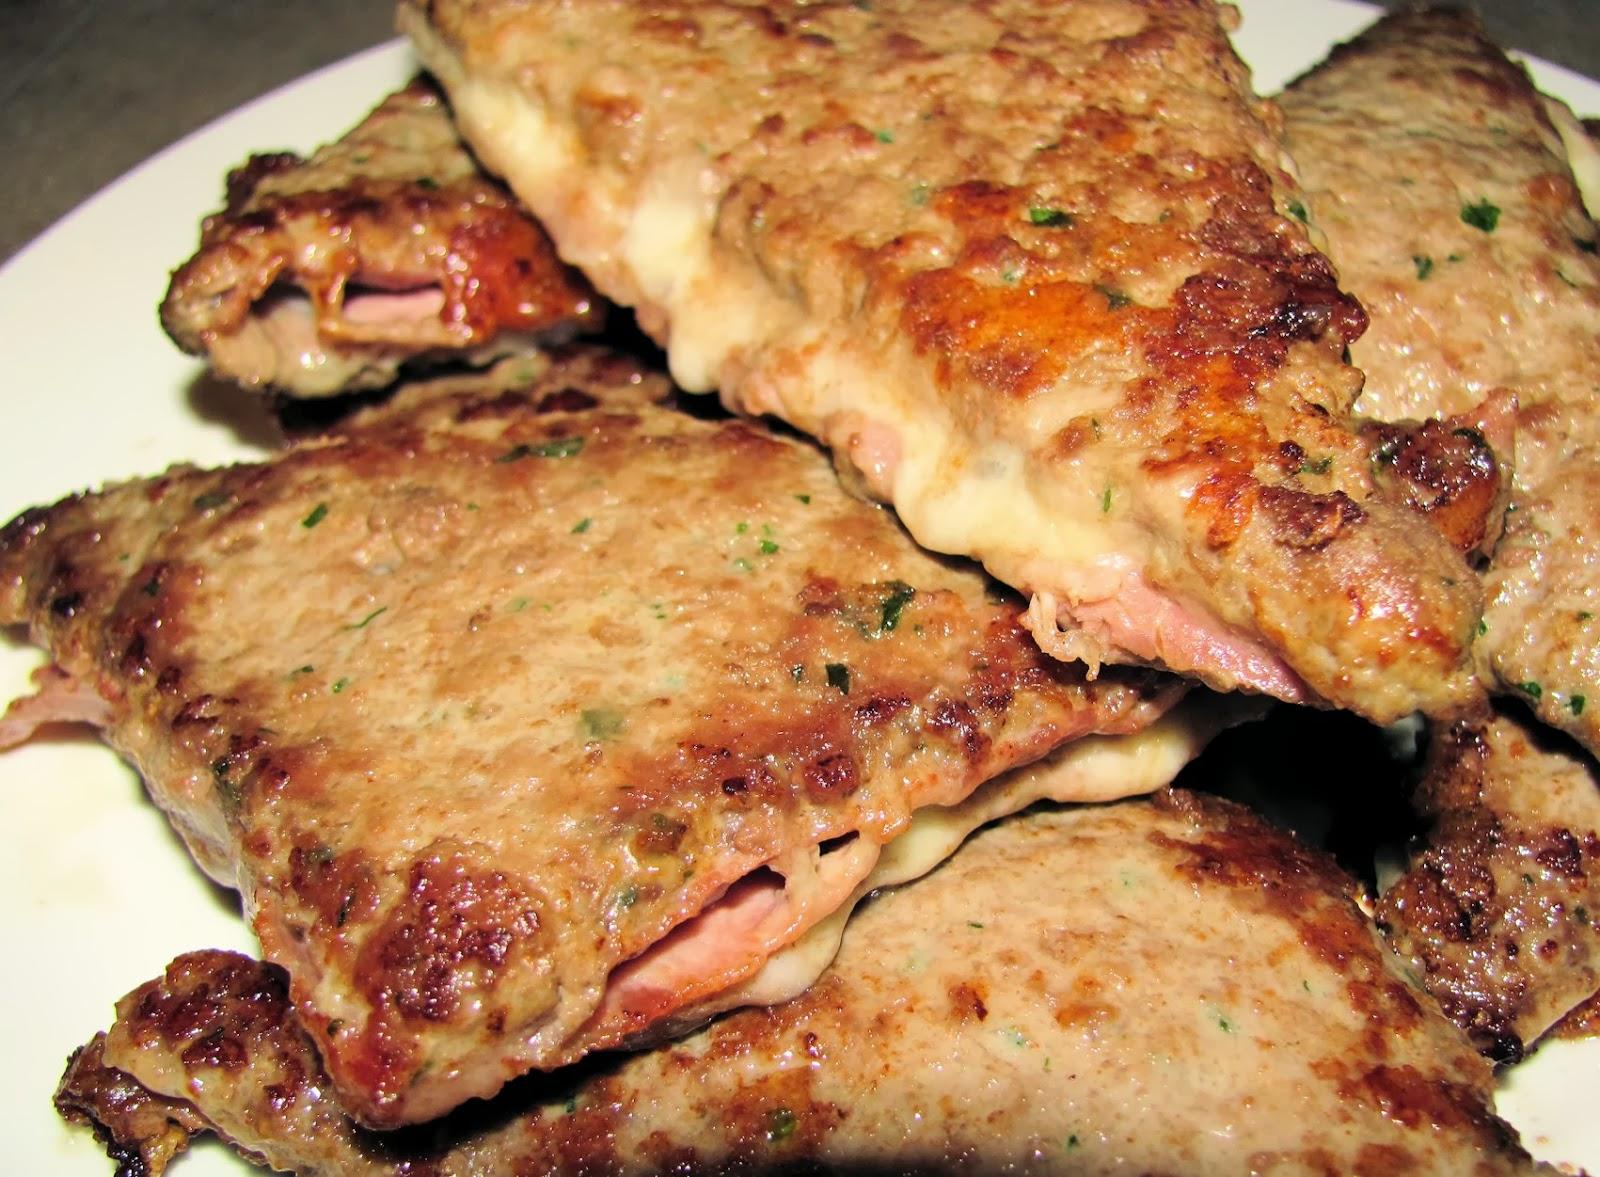 La cucina di pucci tramezzini di carne trita farciti for Cucina italiana ricette carne